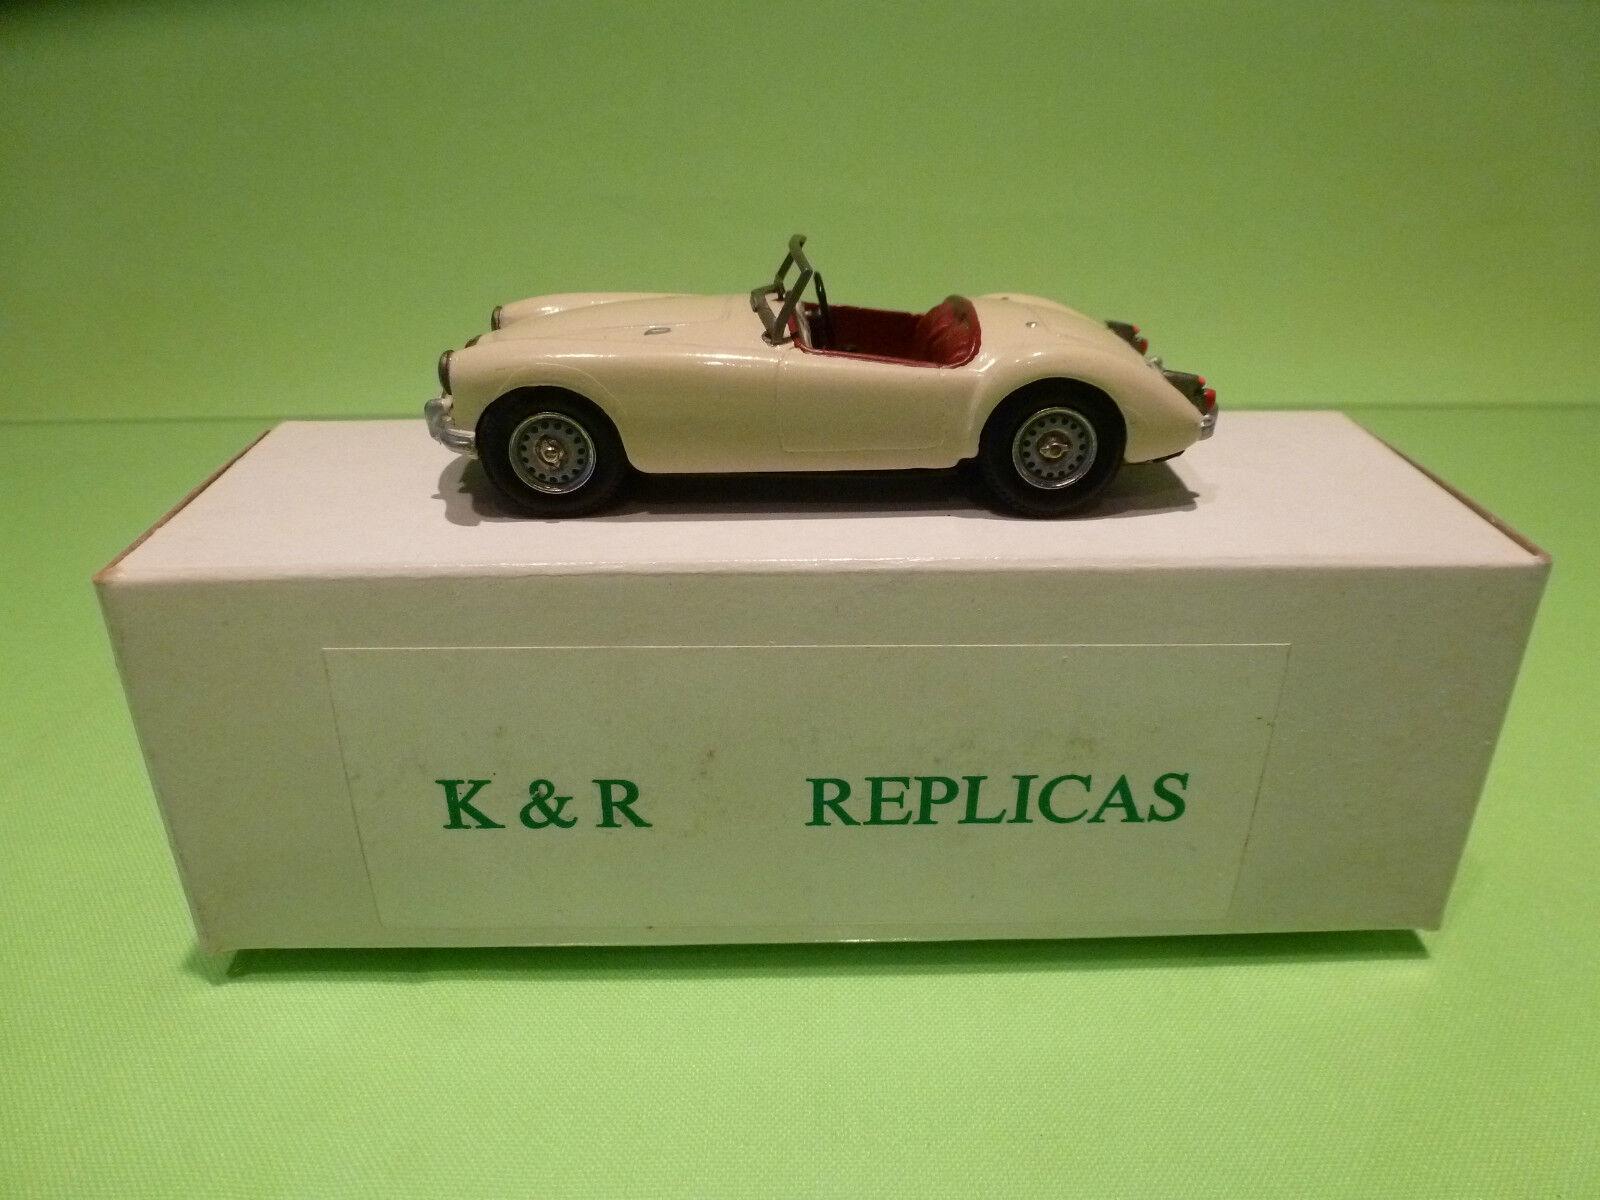 K & R REPLICAS - ACE KAR KITS  MGA 1500 1956  1 43  - IN BOX  - GOOD CONDITION